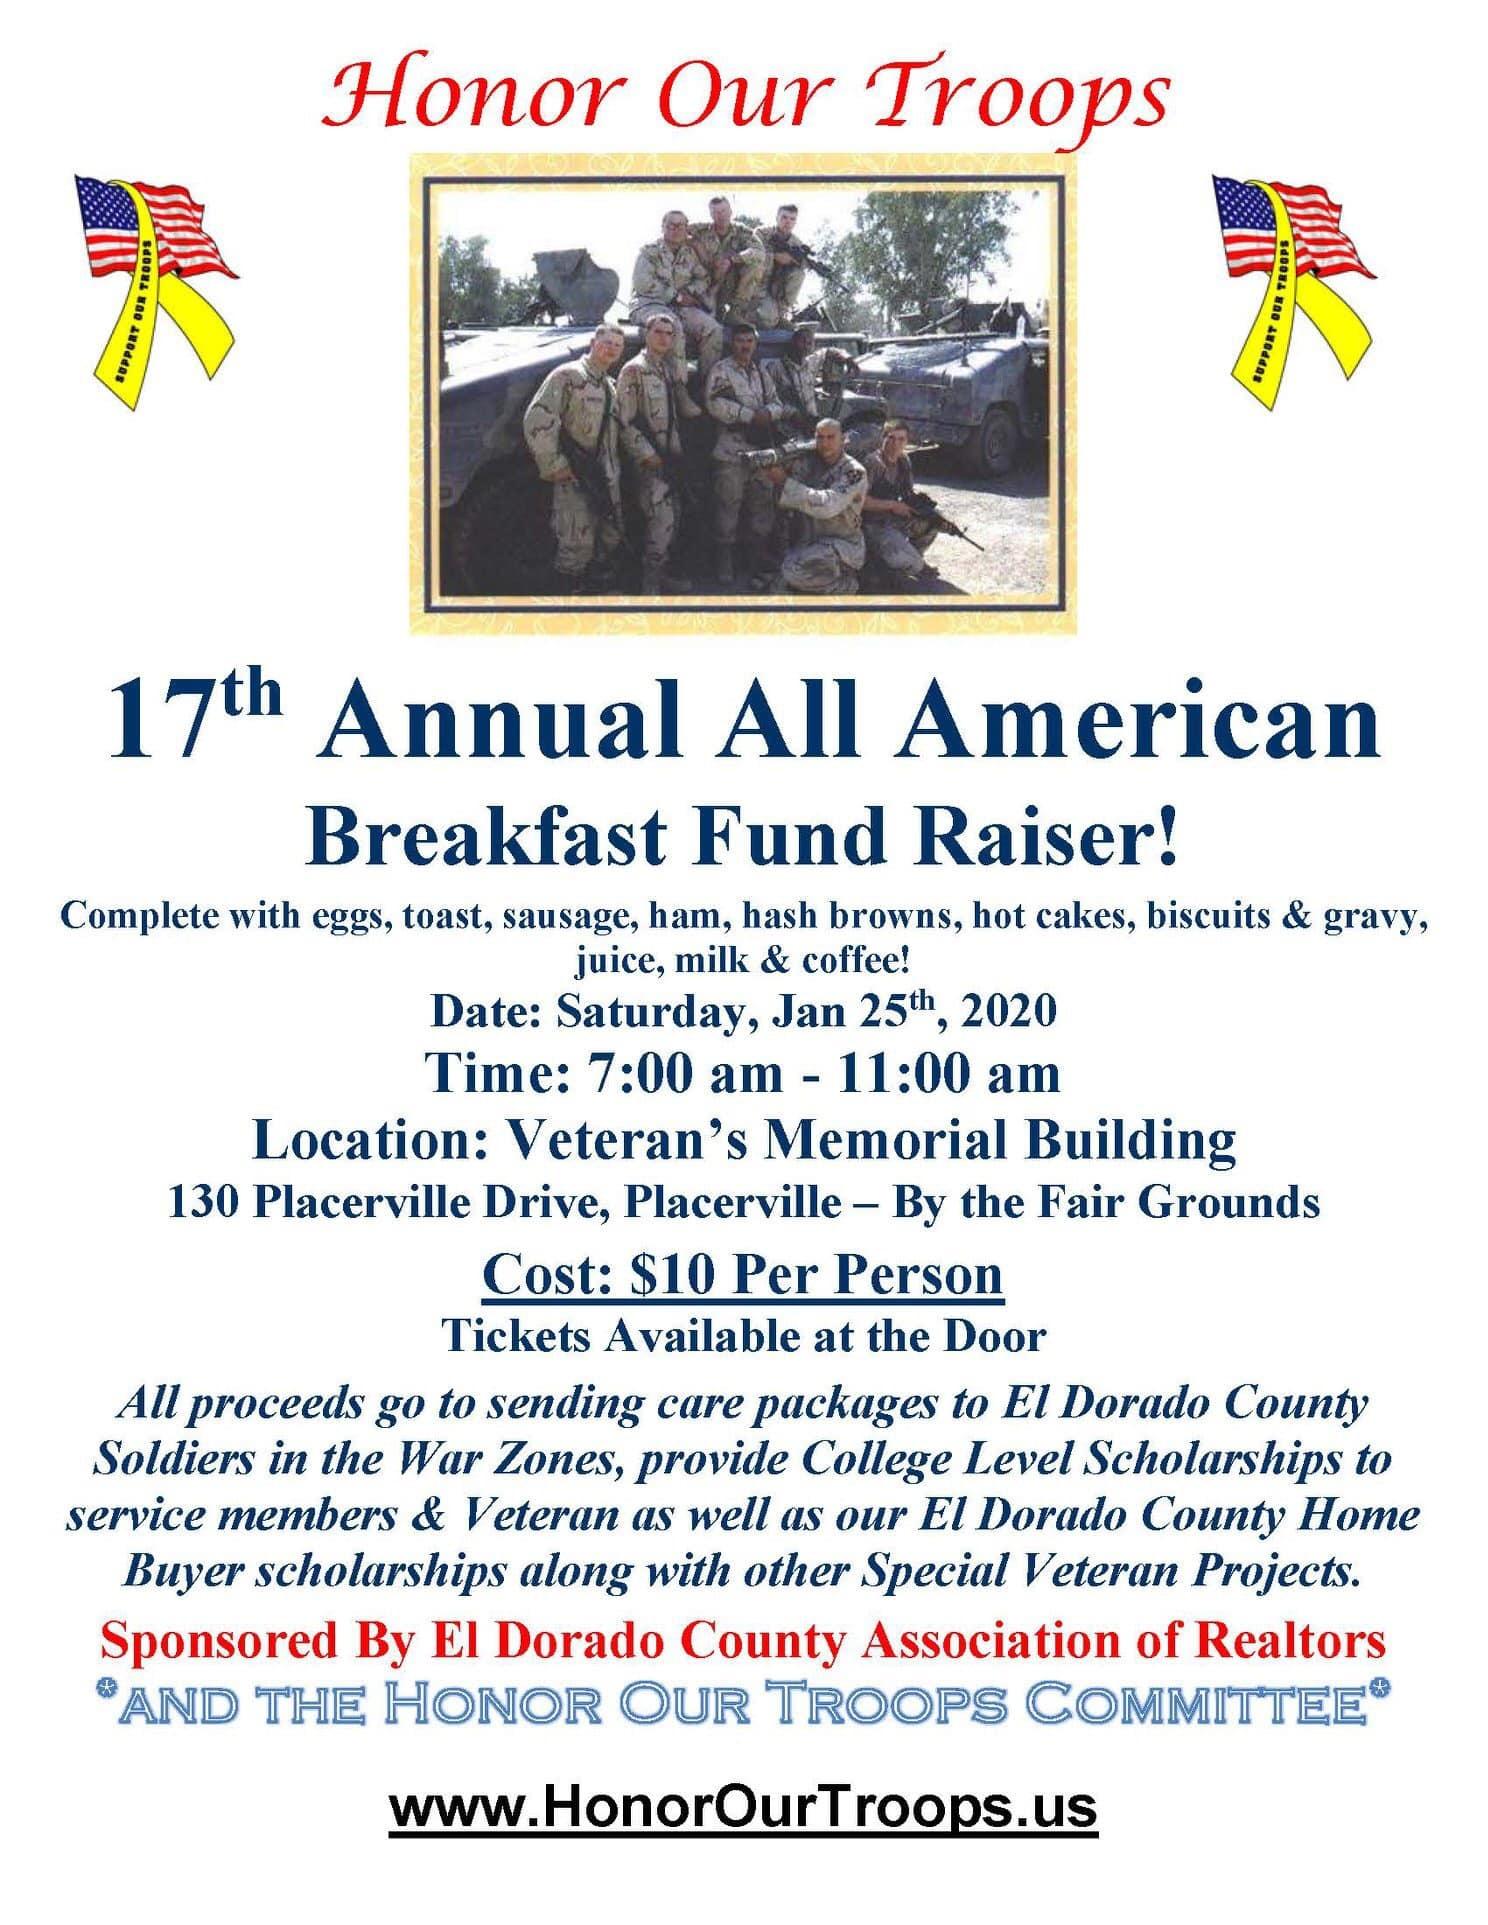 Jan 25 Veterans event